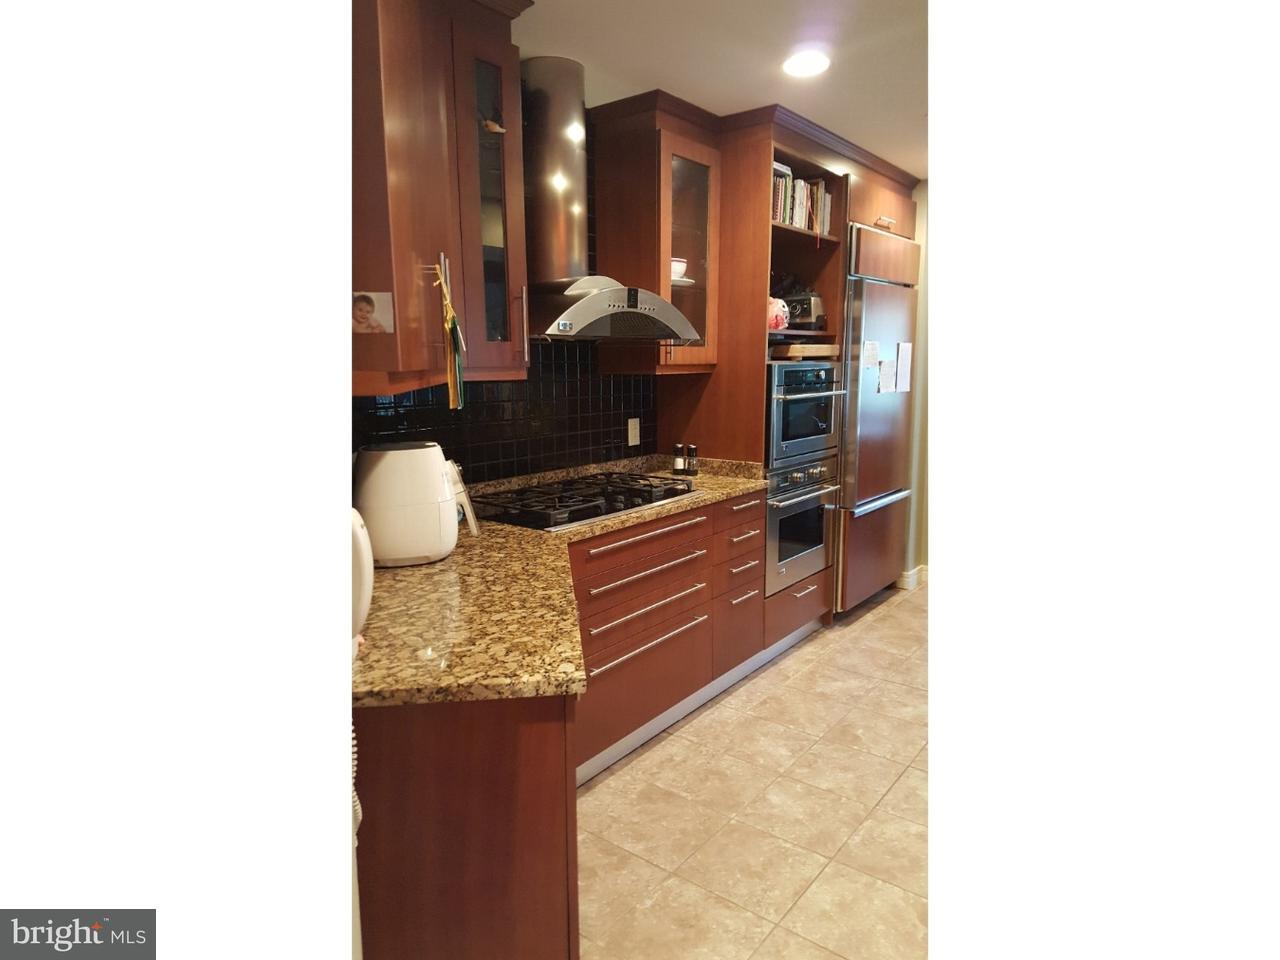 Condominium for Sale at 190 PRESIDENTIAL BLVD #319 Bala Cynwyd, Pennsylvania 19004 United States